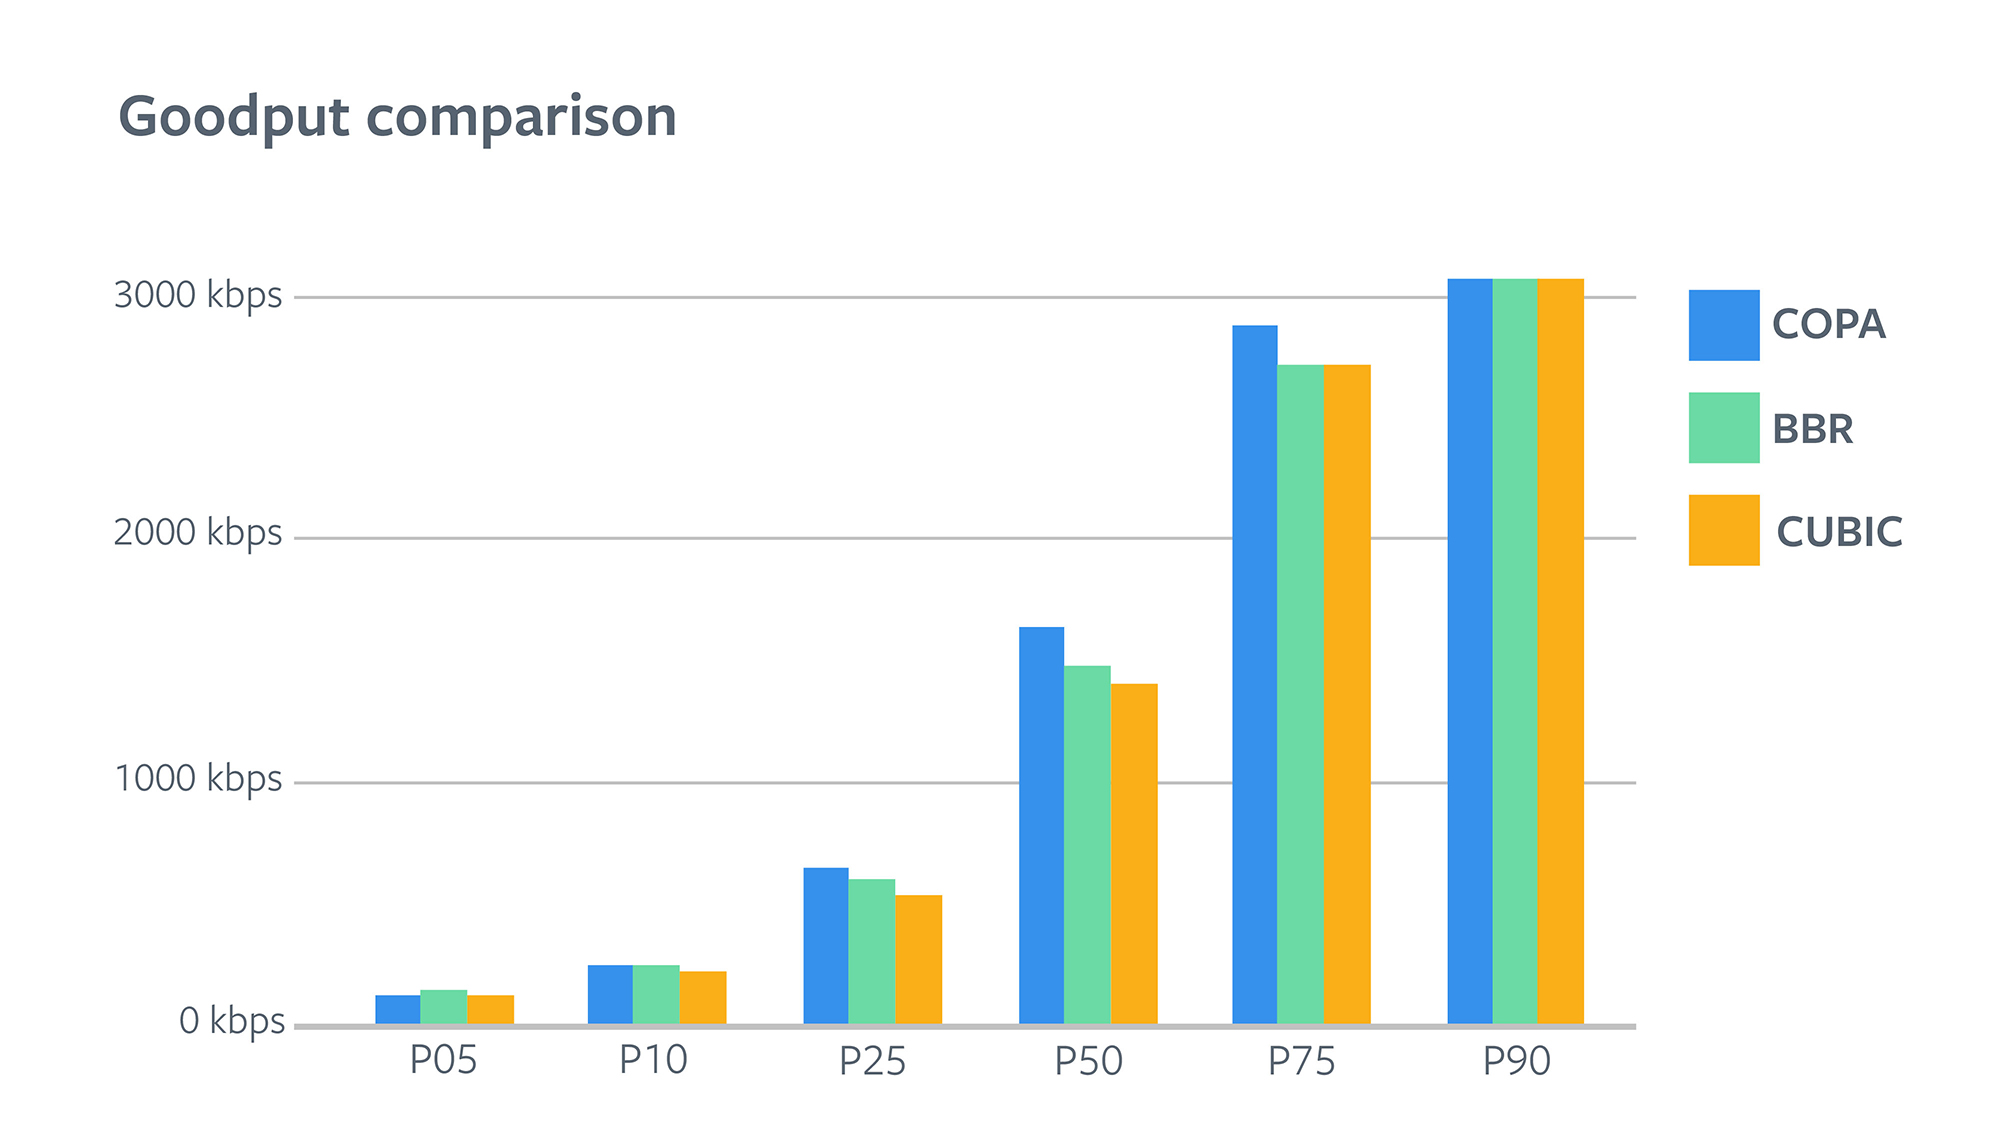 Goodput comparison